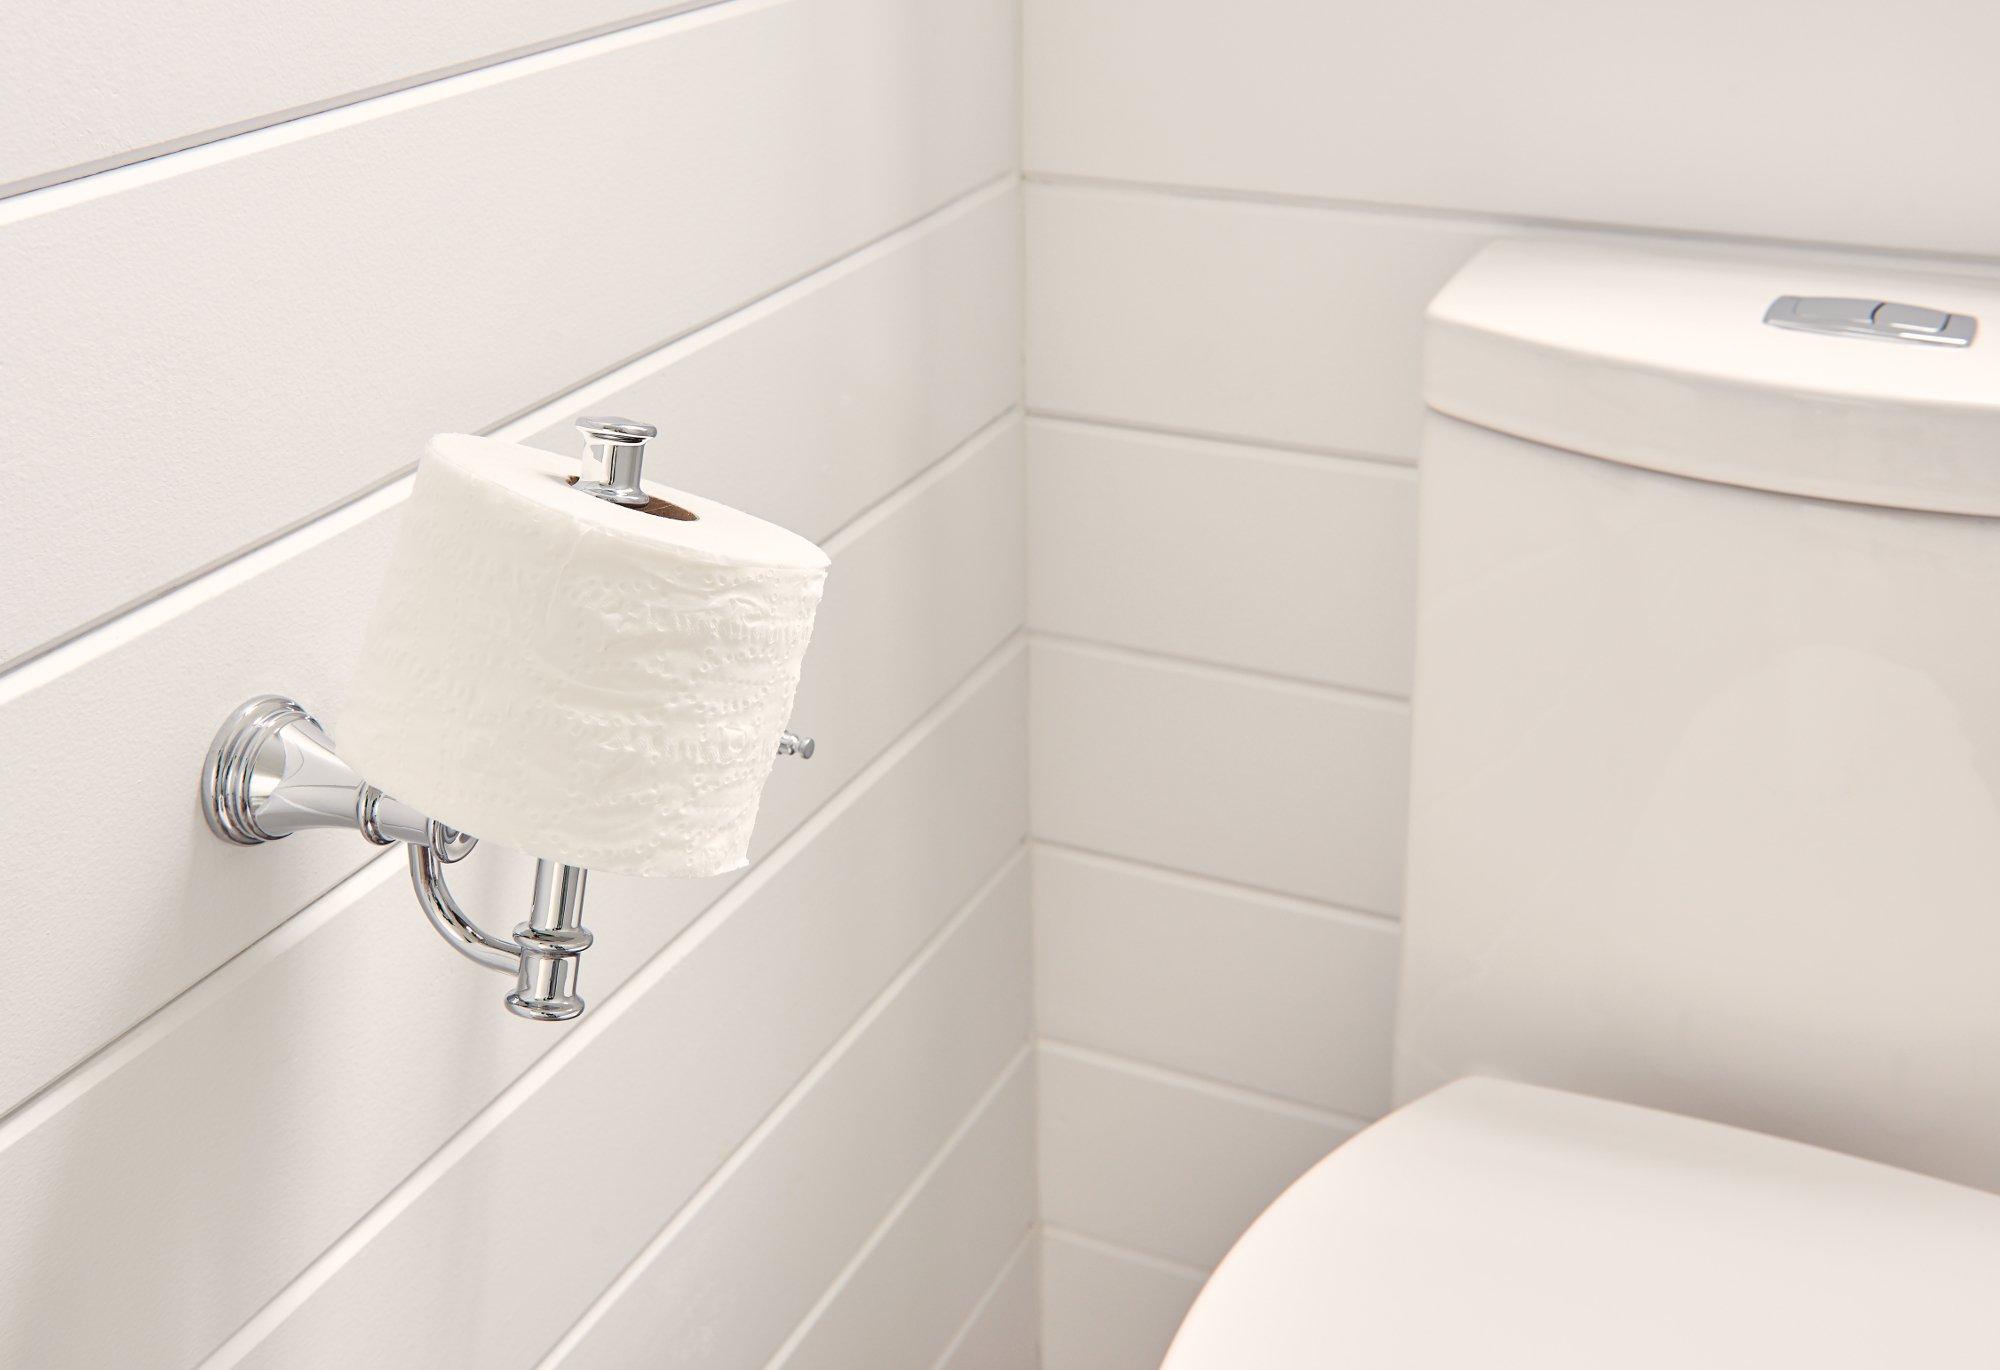 Moen YB6408CH Belfield Pivoting Toilet Paper Holder, Chrome by Moen (Image #3)